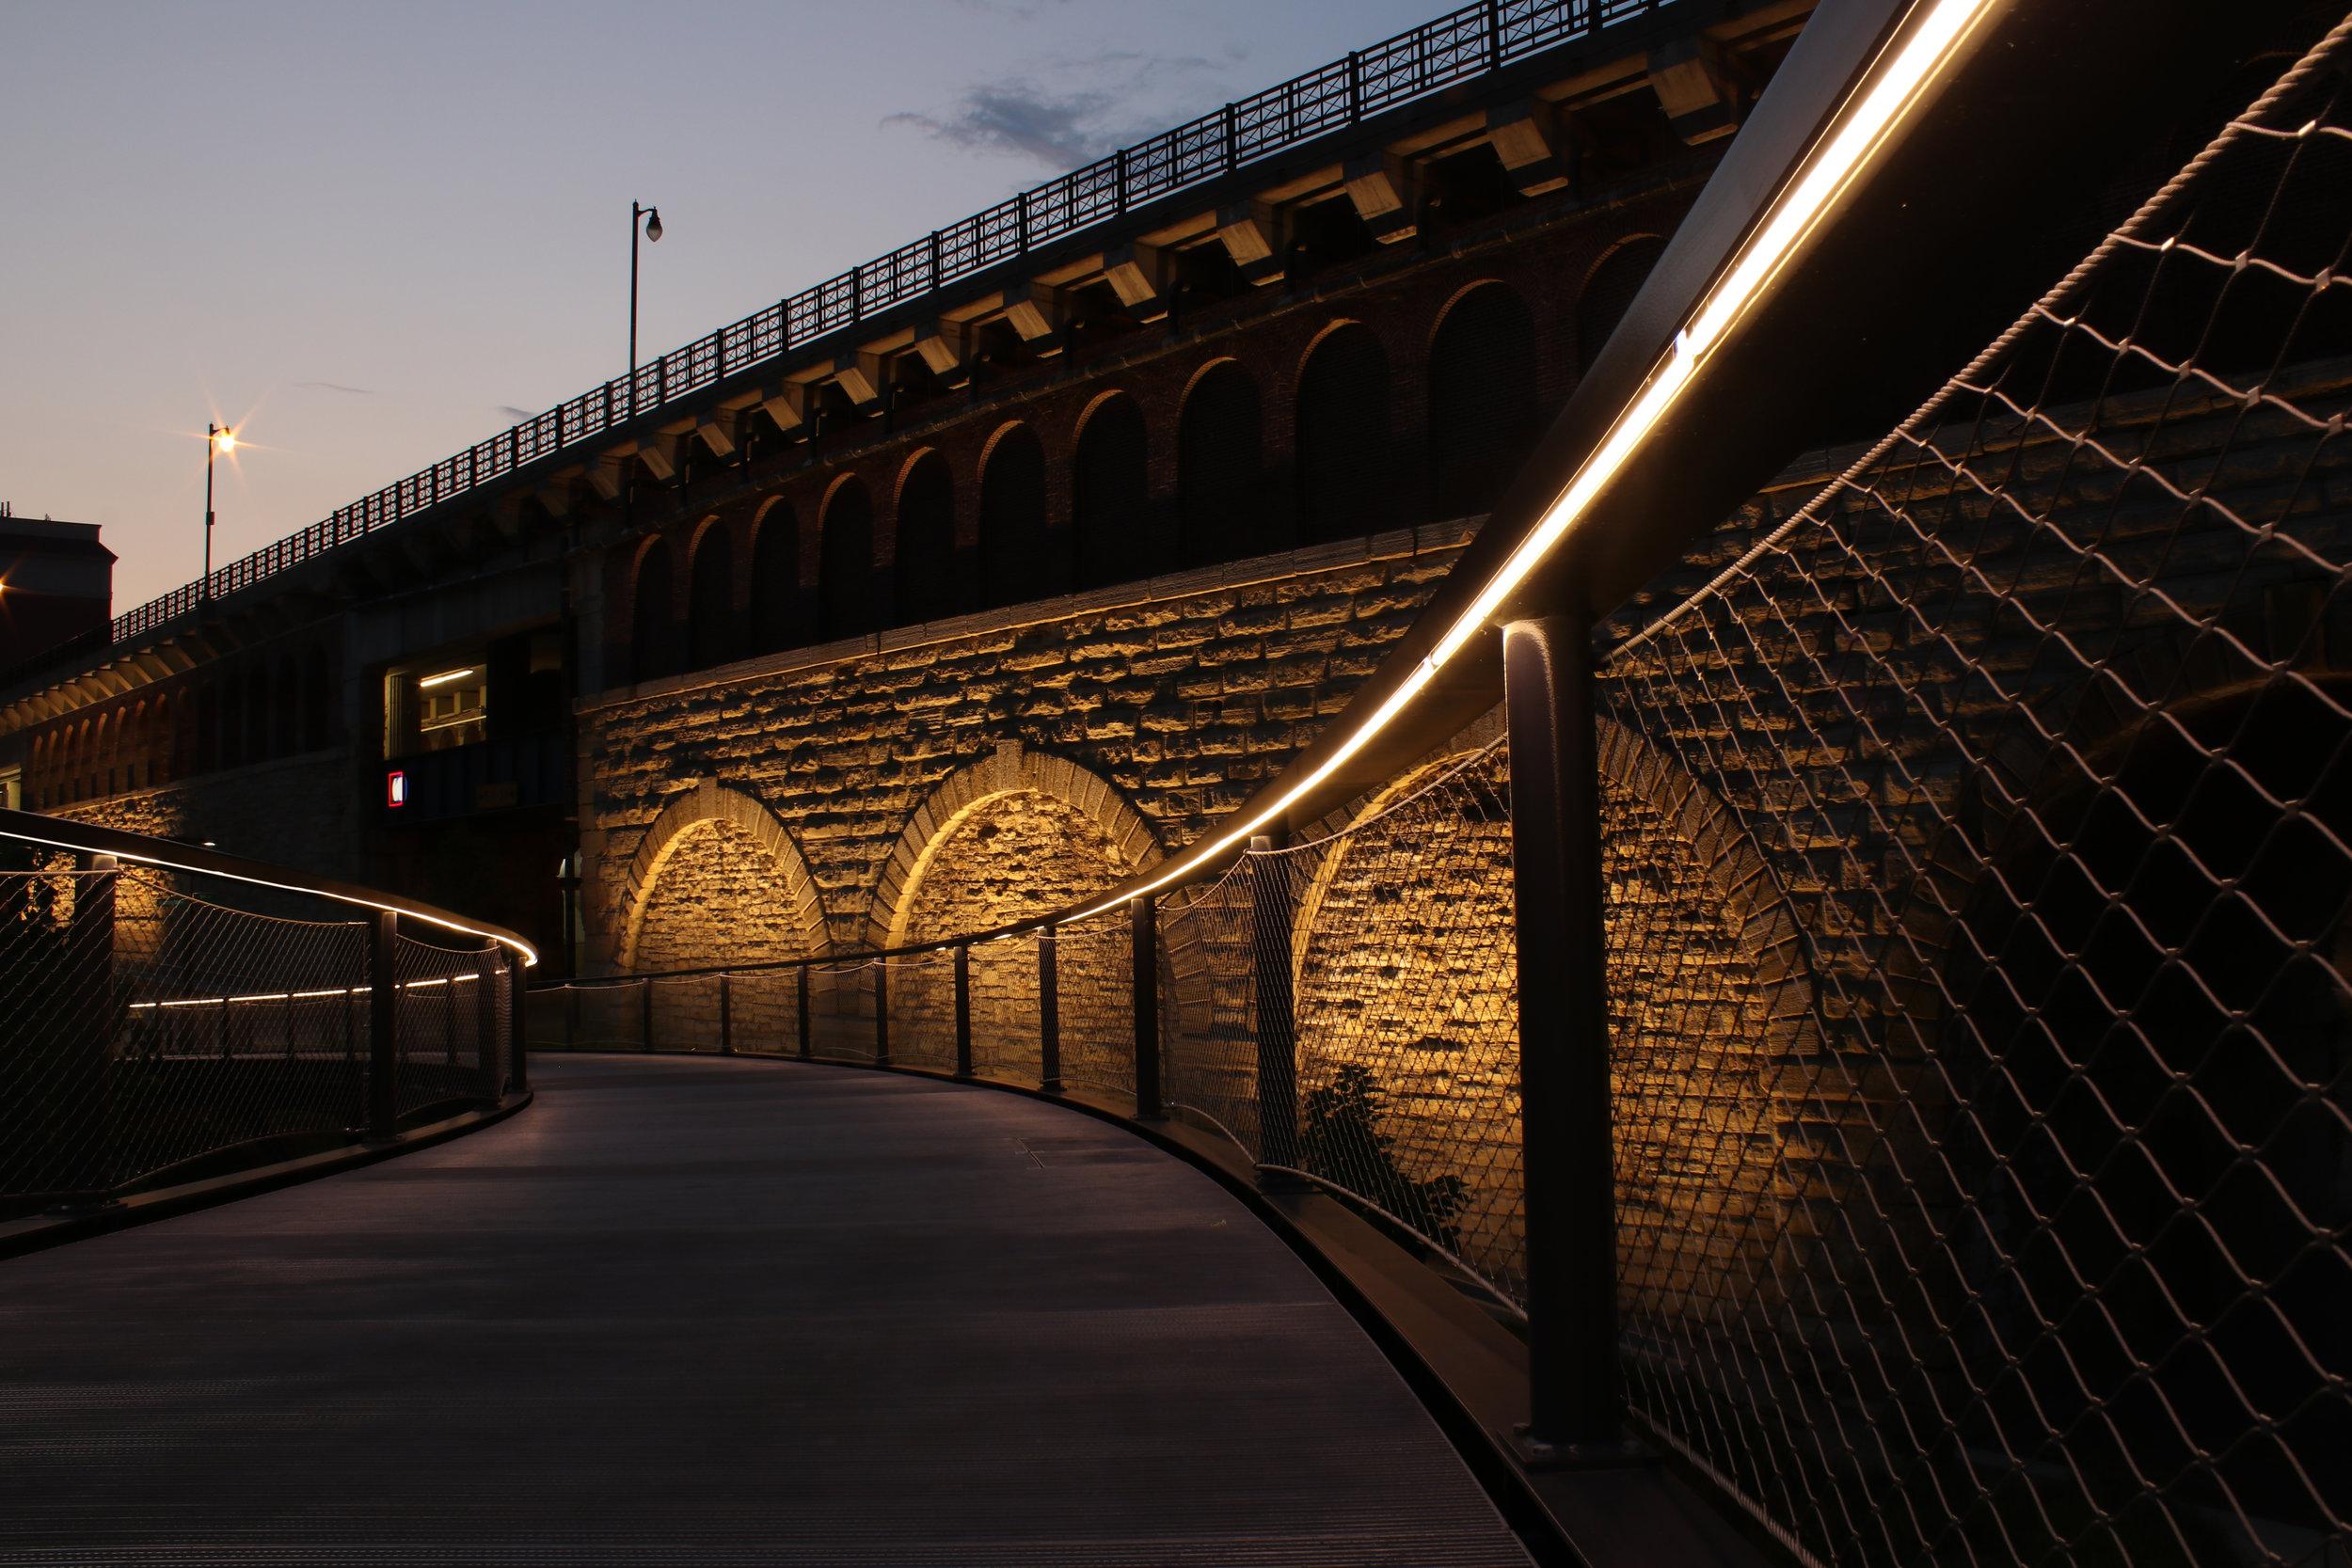 iLight-3-St-Louis-Gateway-Arch-linear-LED-handrail-09b.jpg